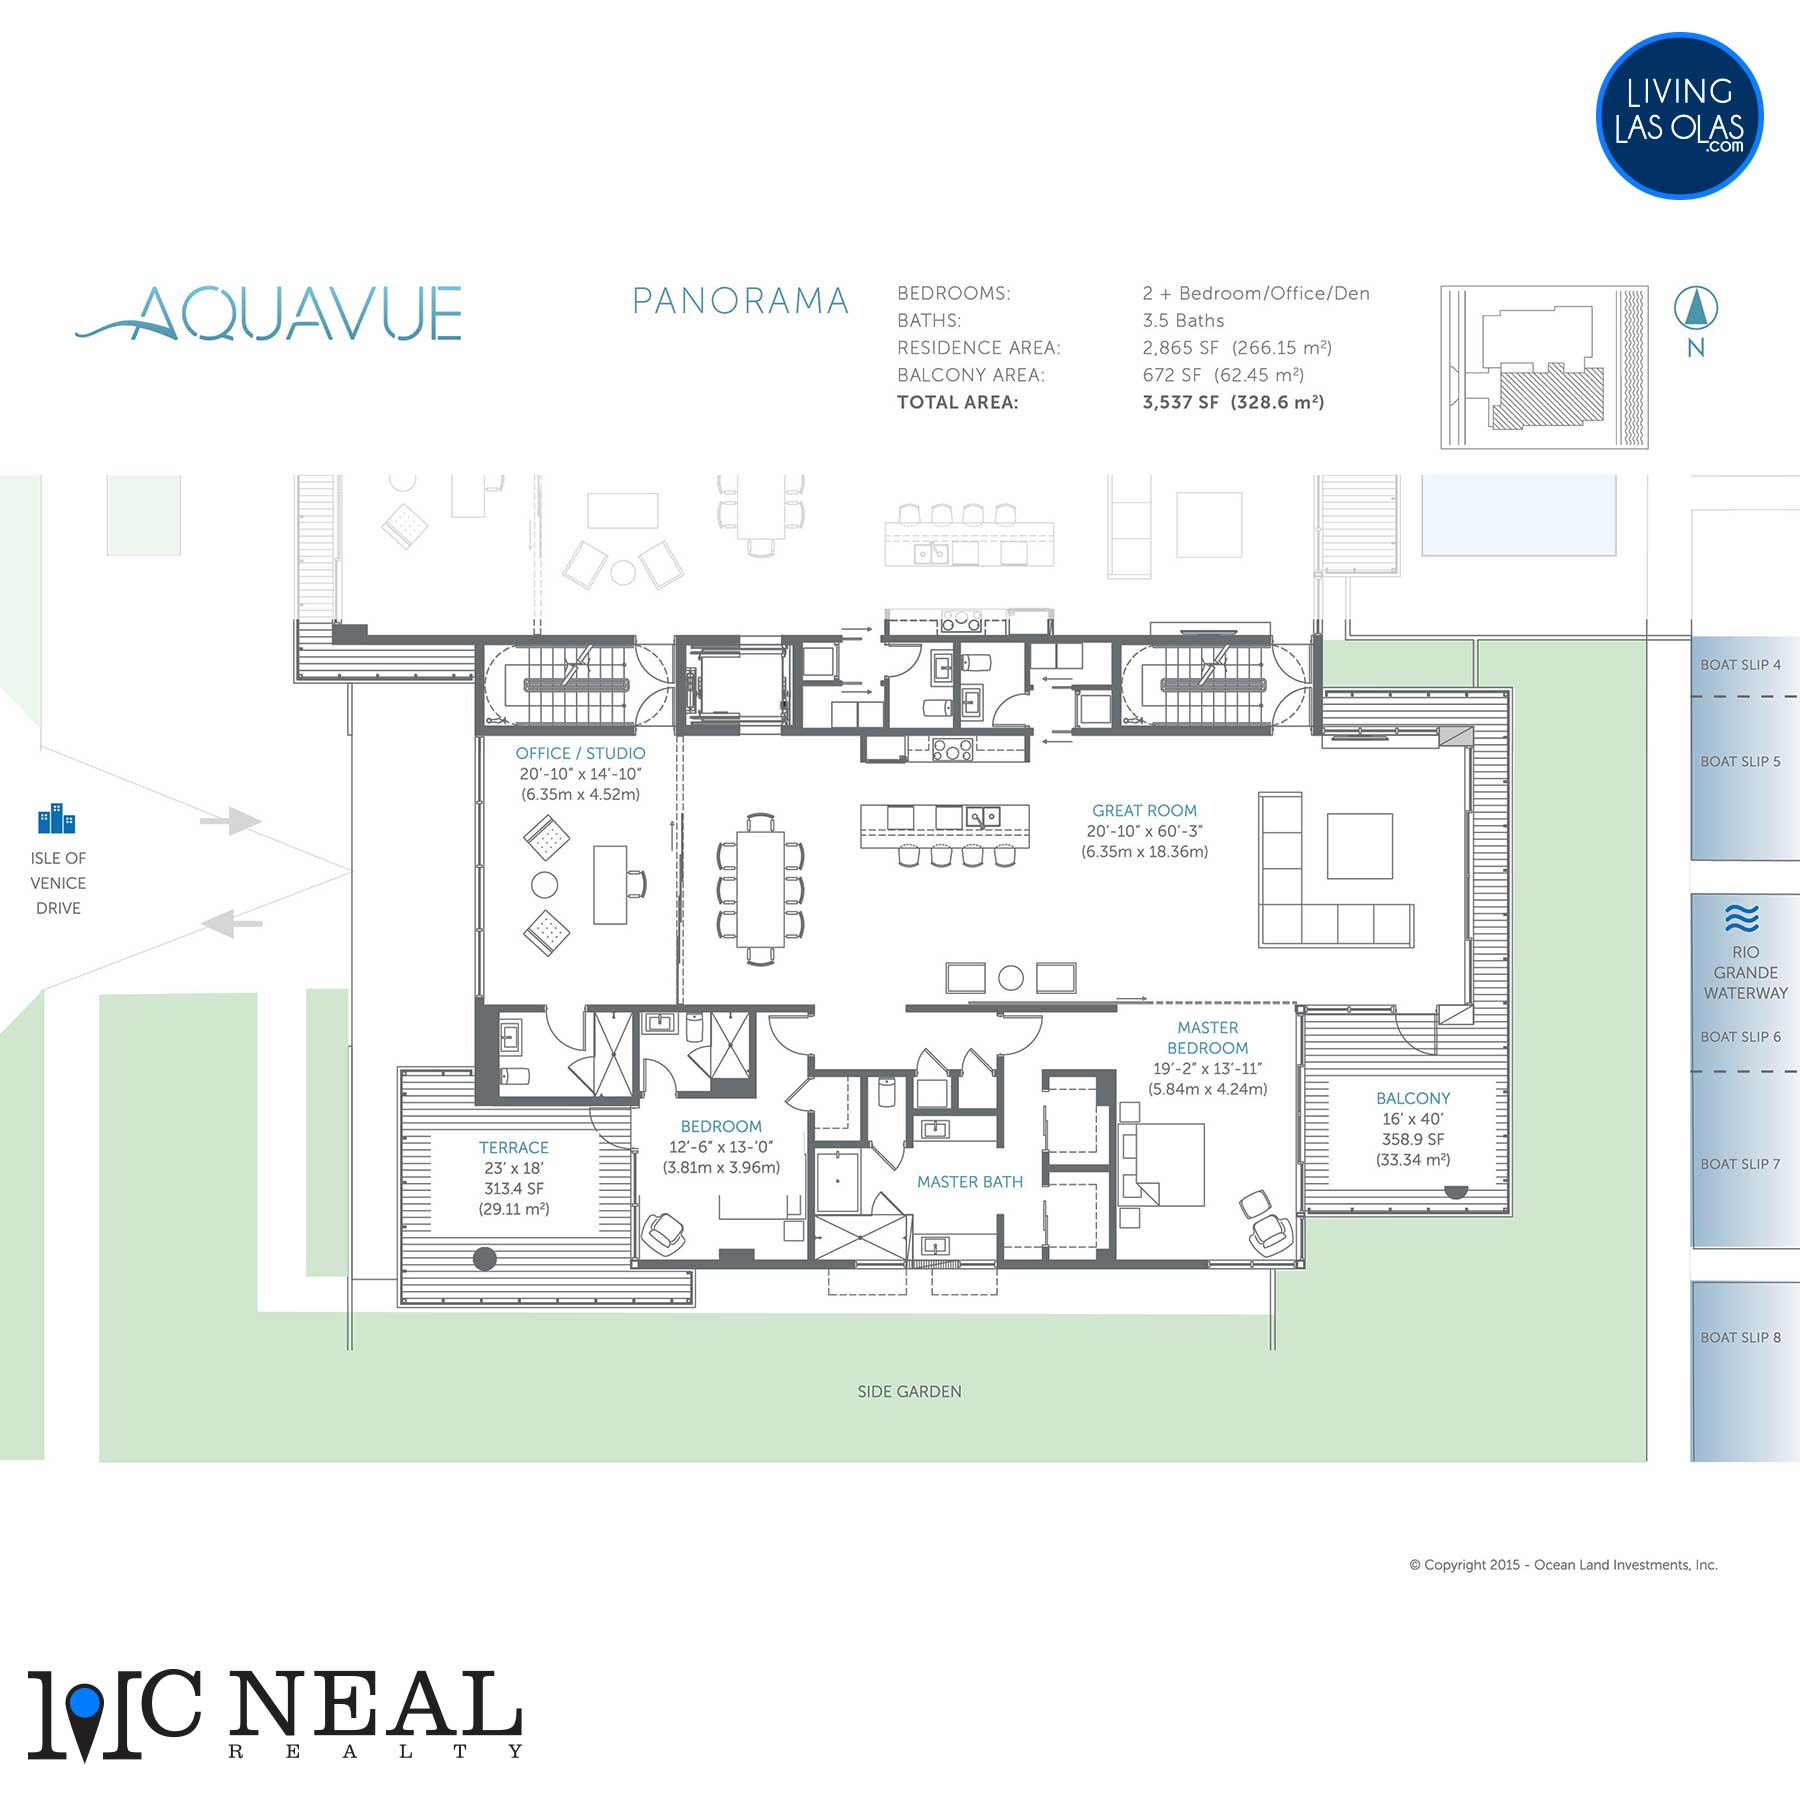 AquaVue Las Olas Floor Plans Panorama